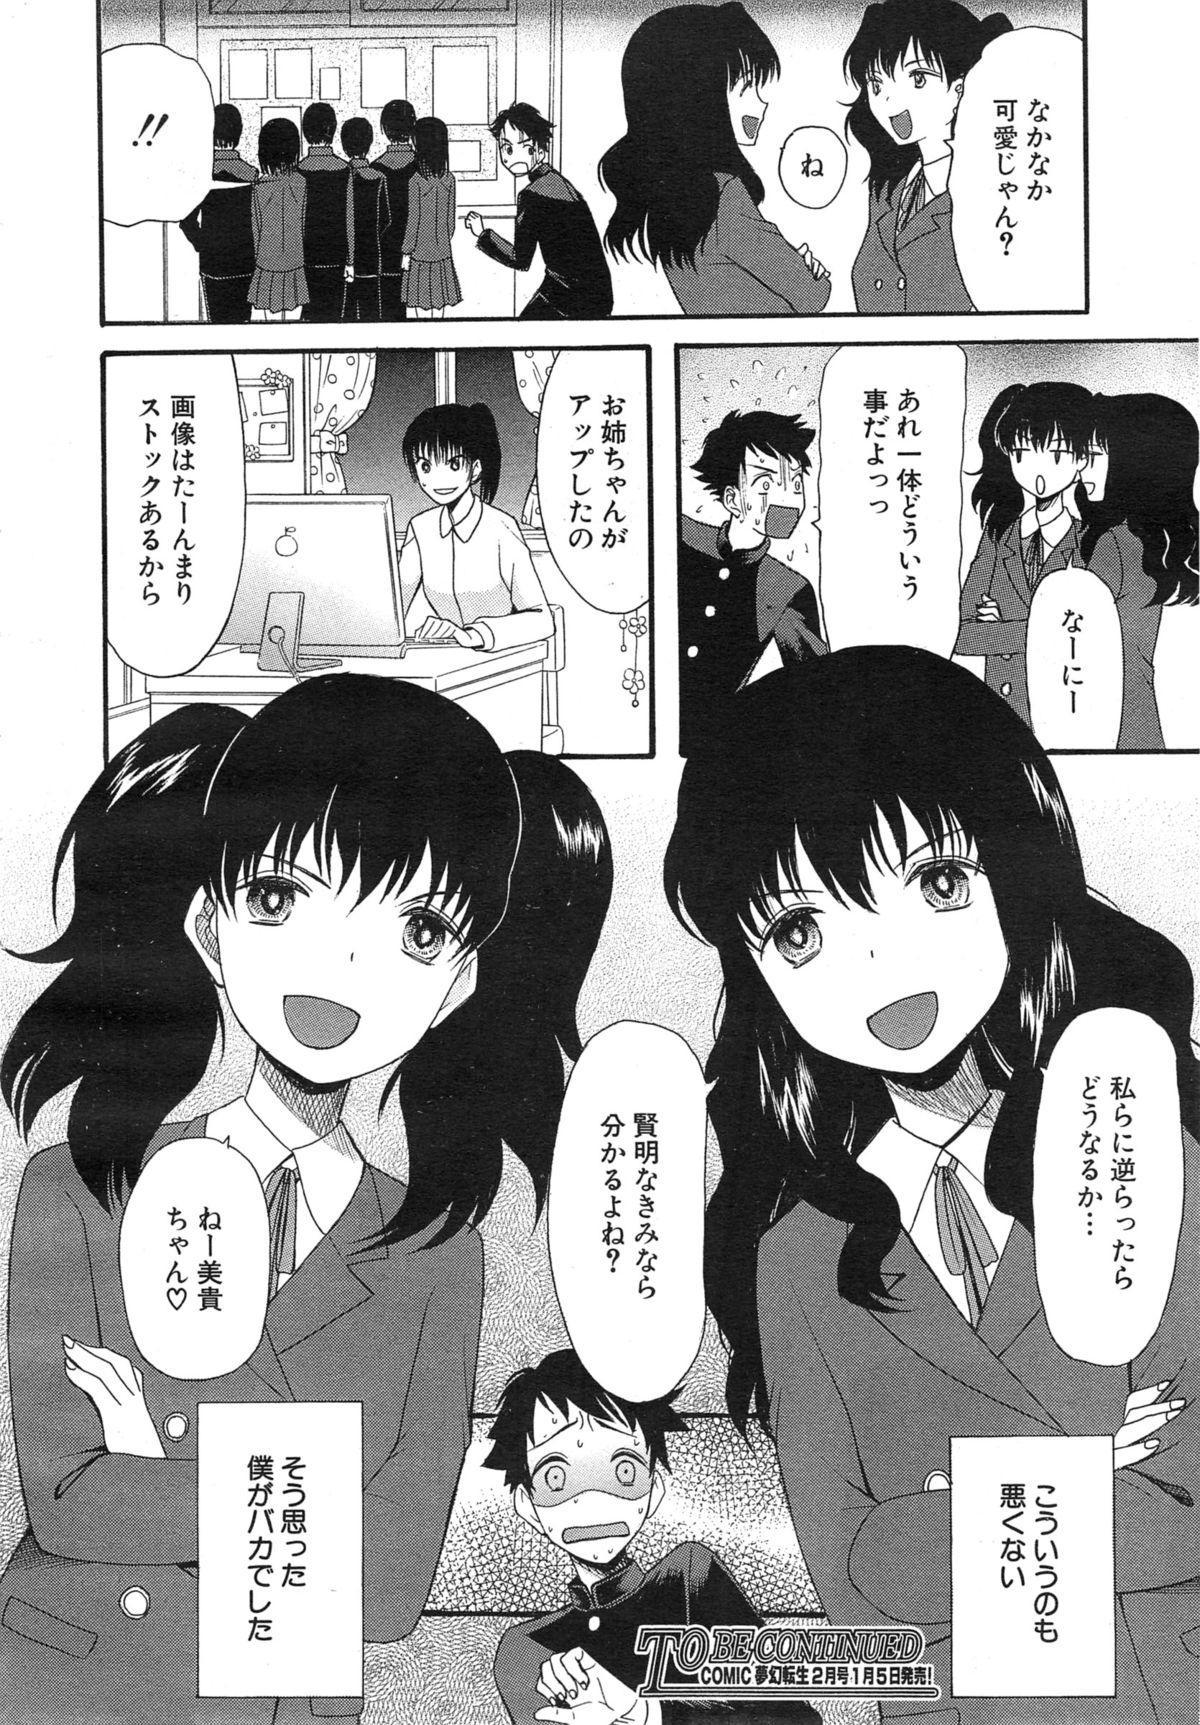 Kawaiku Natte Omocha ni Natte 31